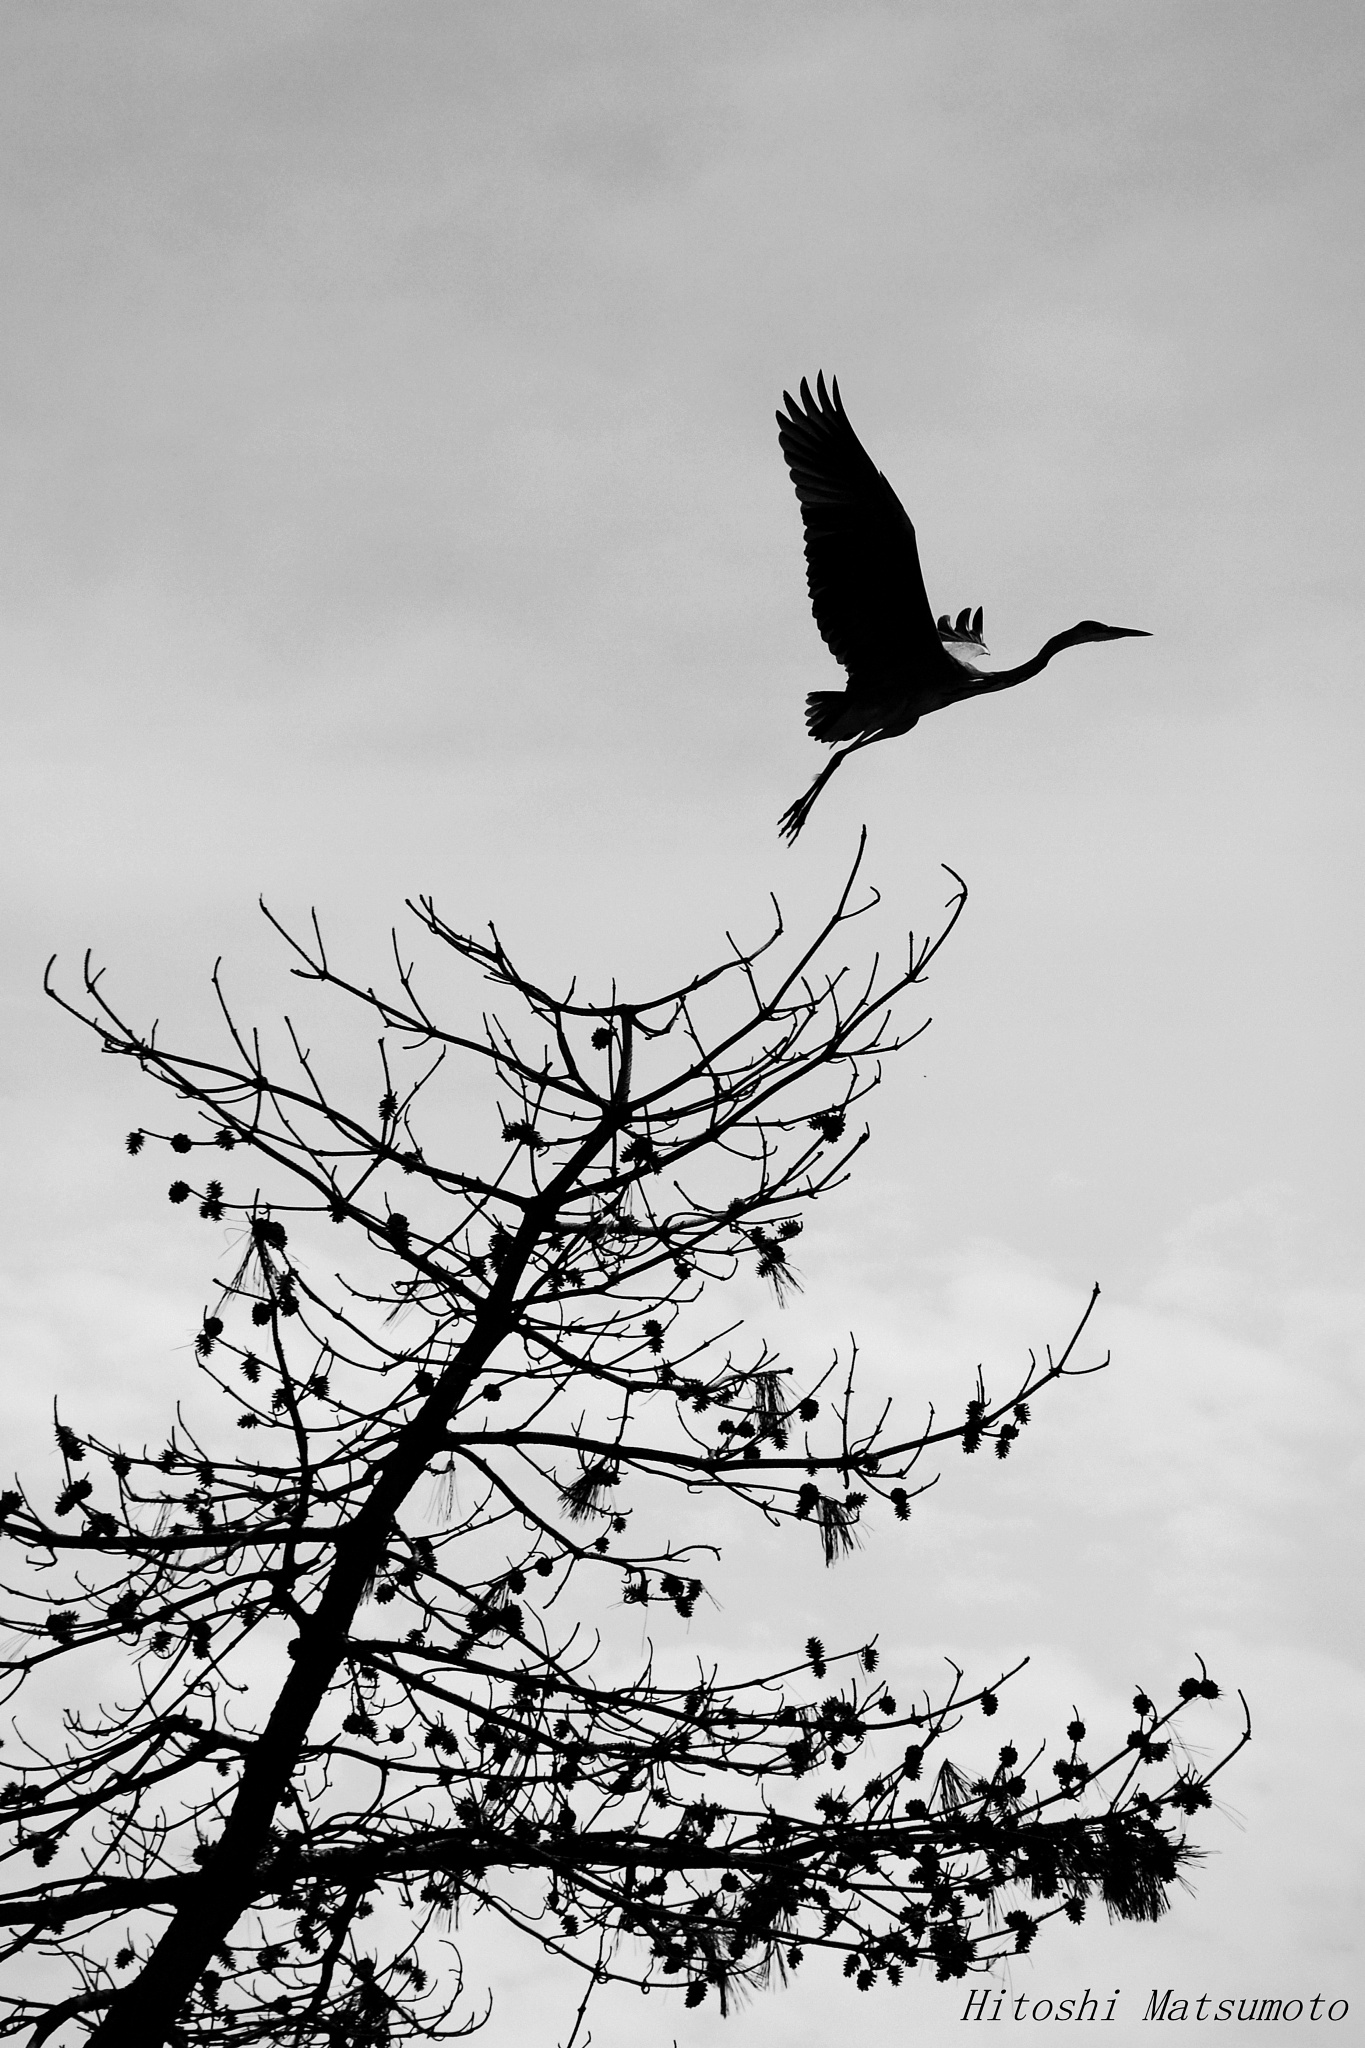 Fly away by Hitoshi Matsumoto